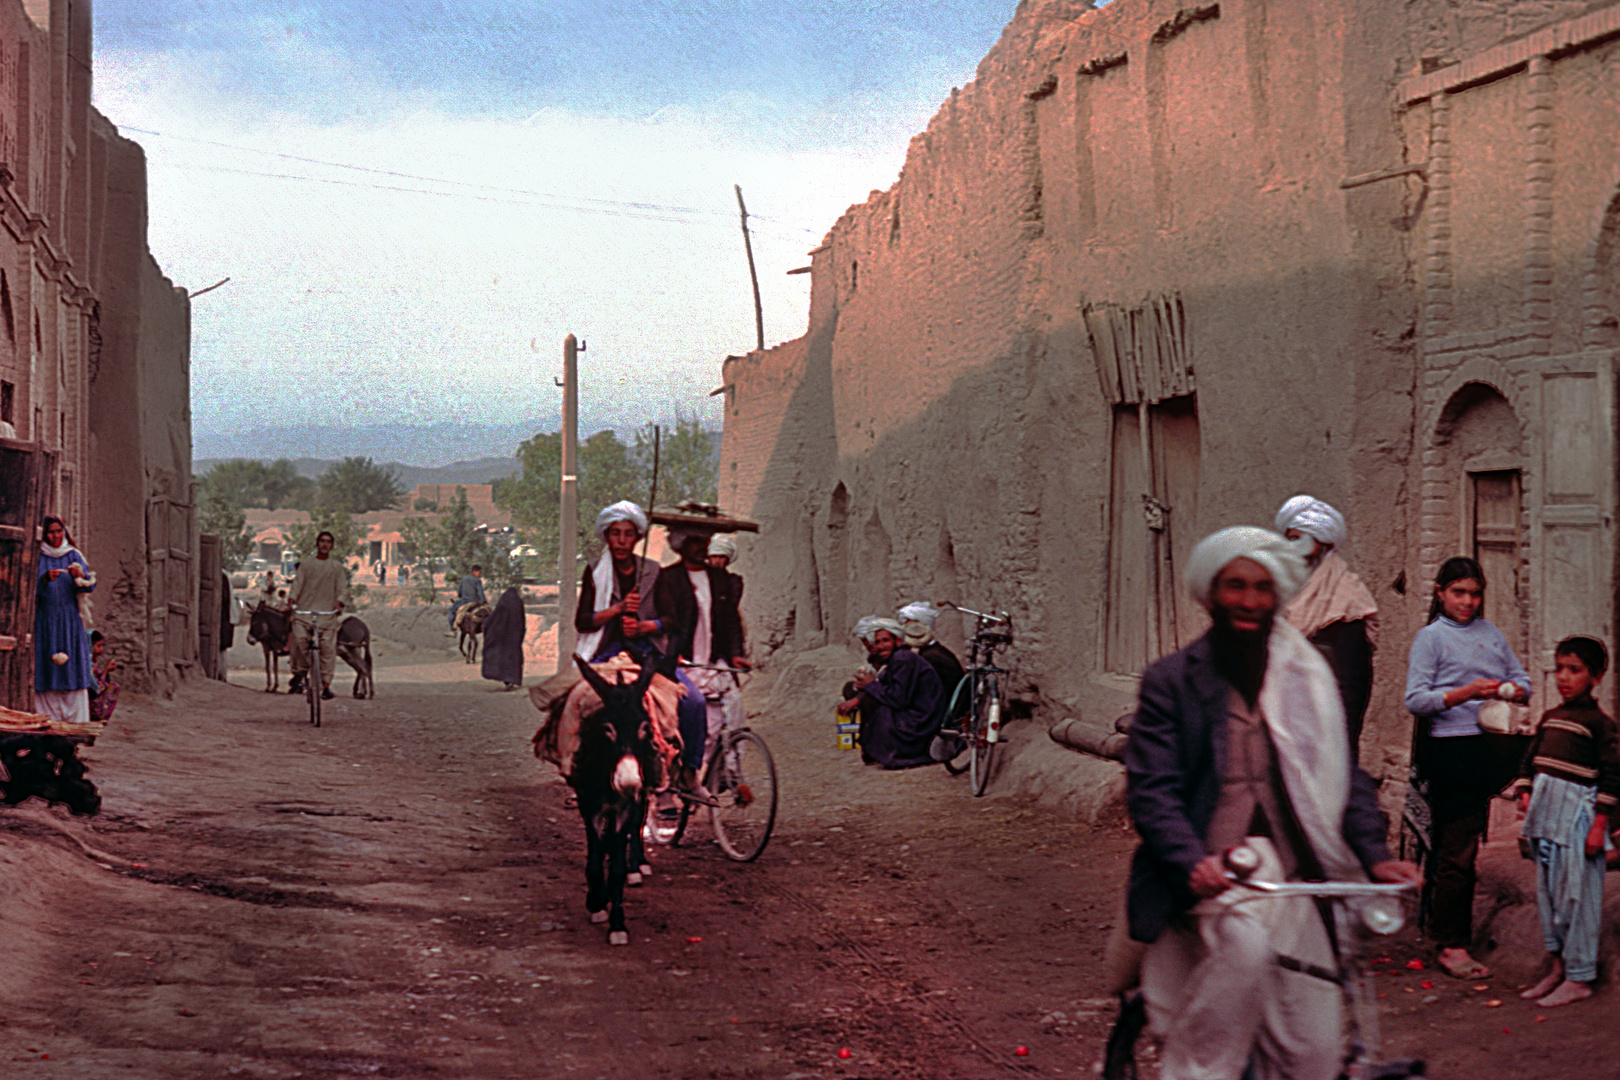 Other scene on the street in Herat